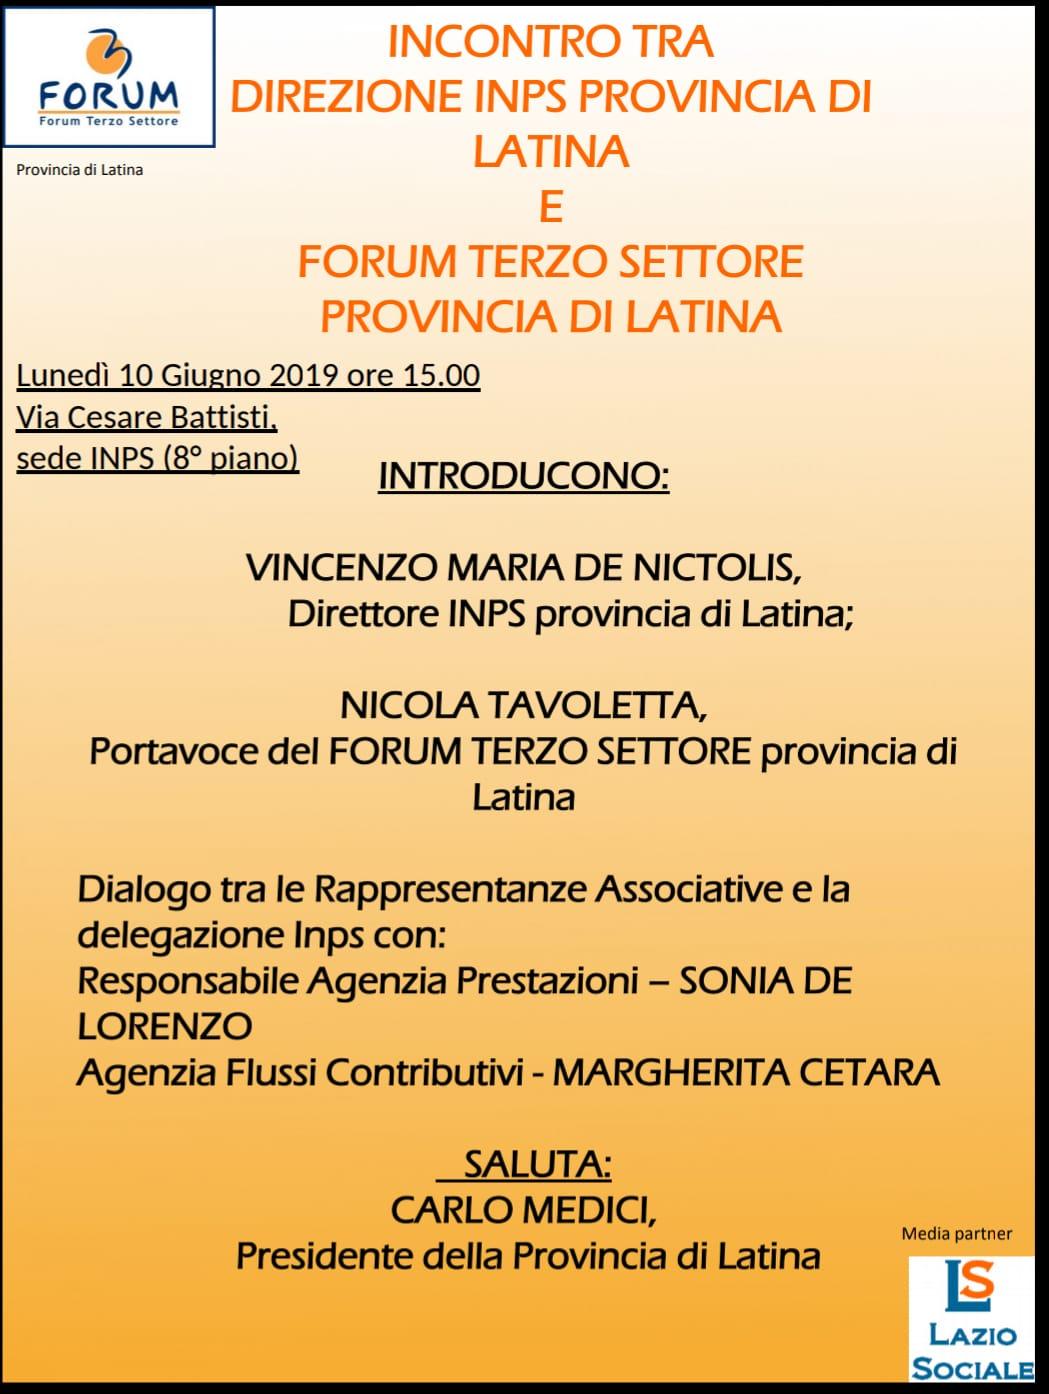 Incontro Dir. INPS Prov. di Latina e forum terzosettore